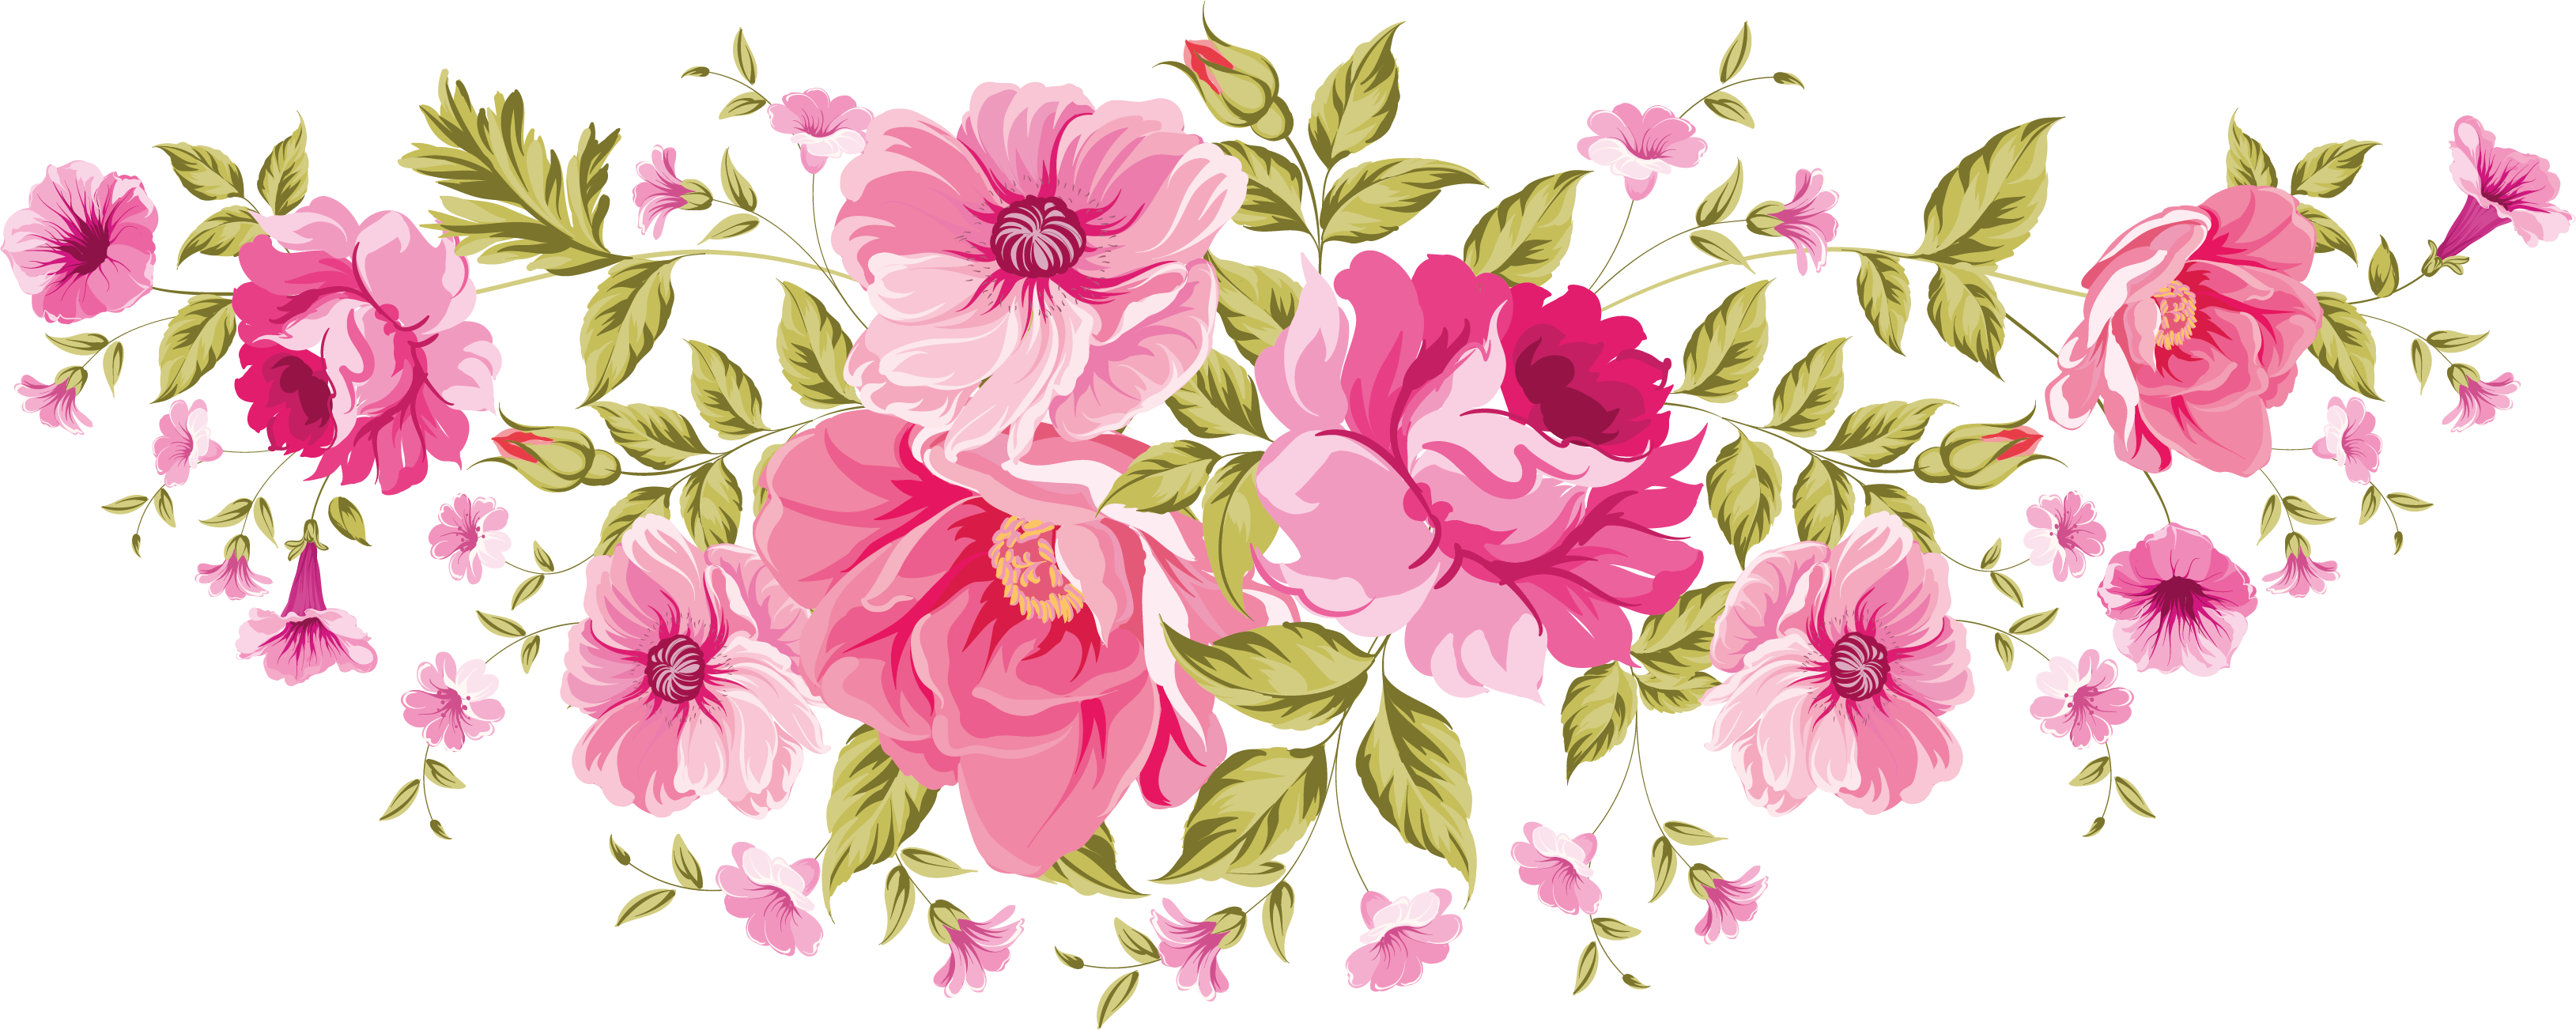 Banner clip art flower. Flowers png xxl decoupage